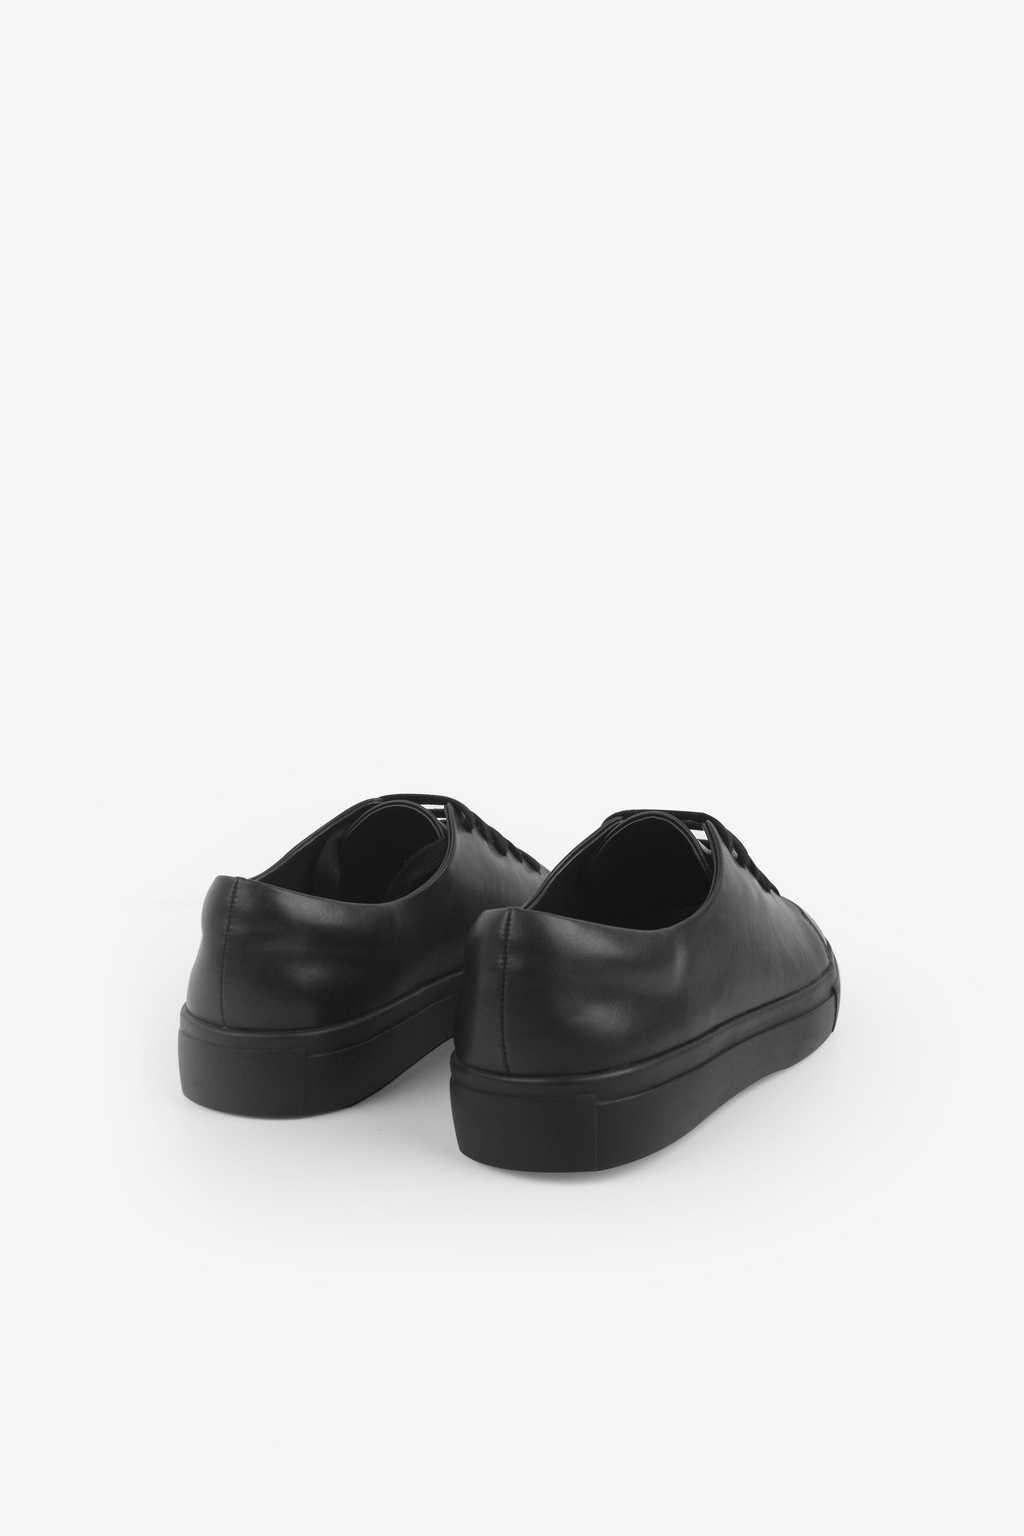 Sneaker 1339 Black 12